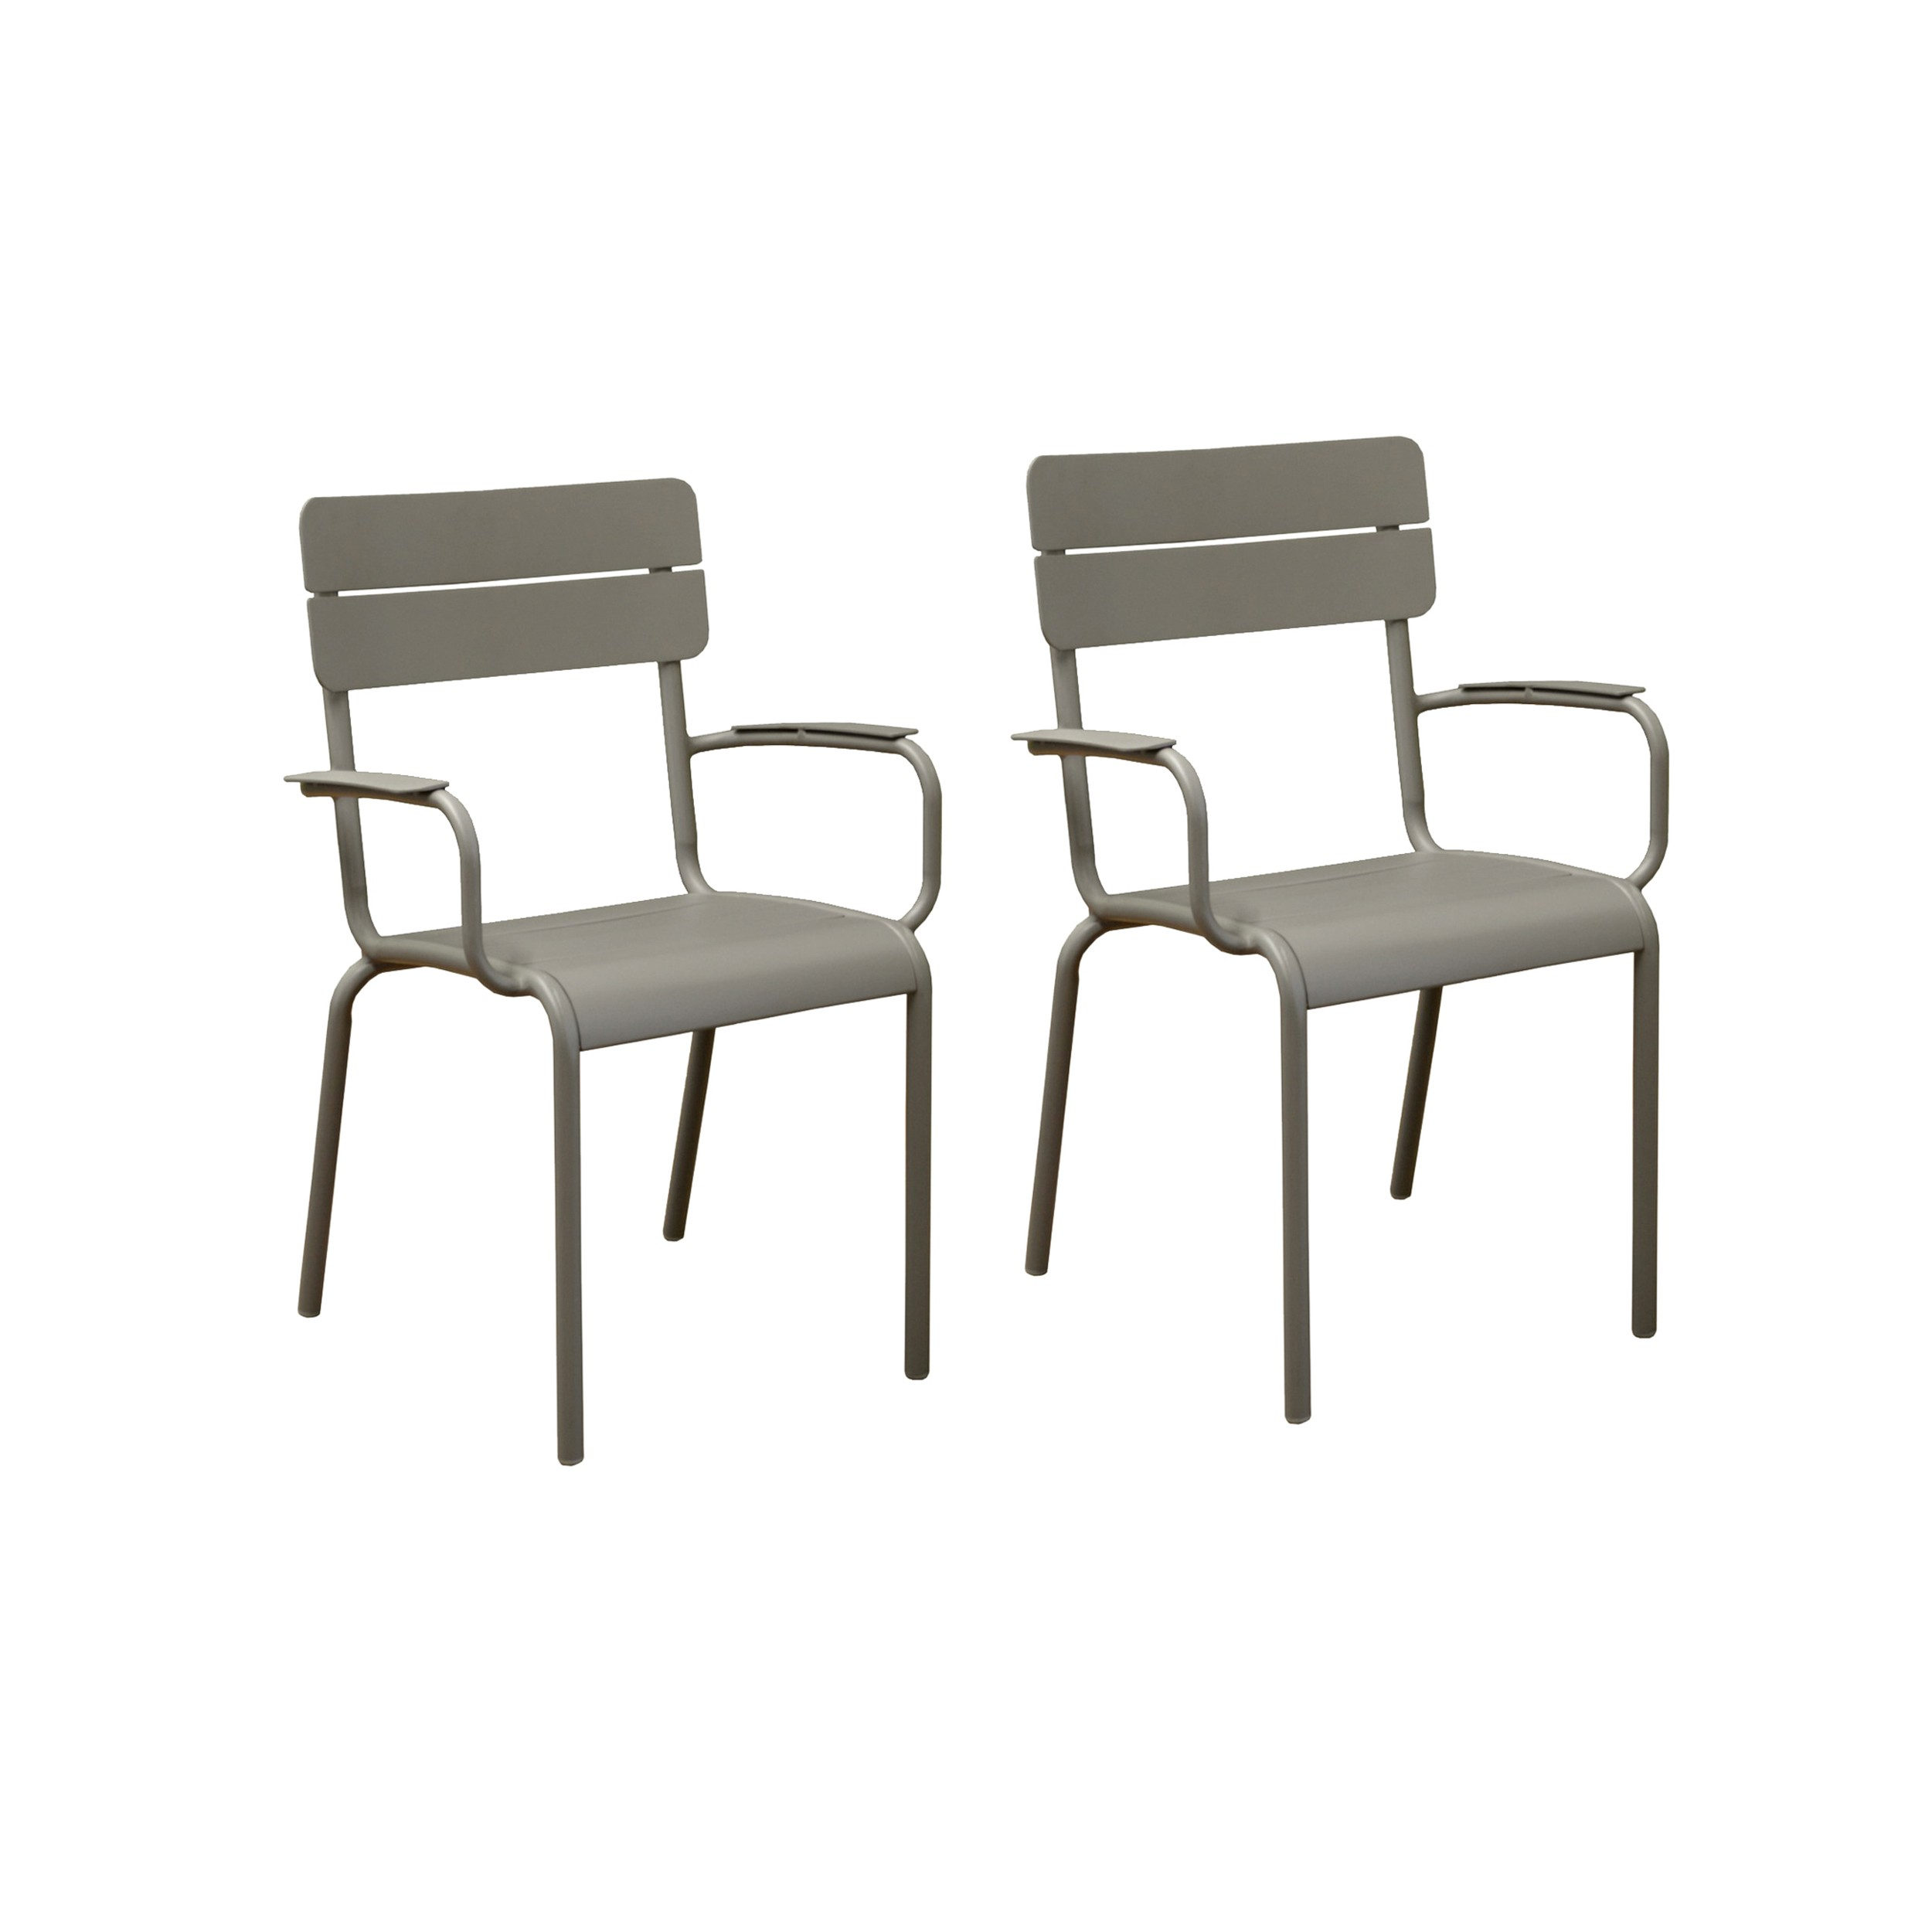 achat fauteuil jardin metal taupe design lot de 2